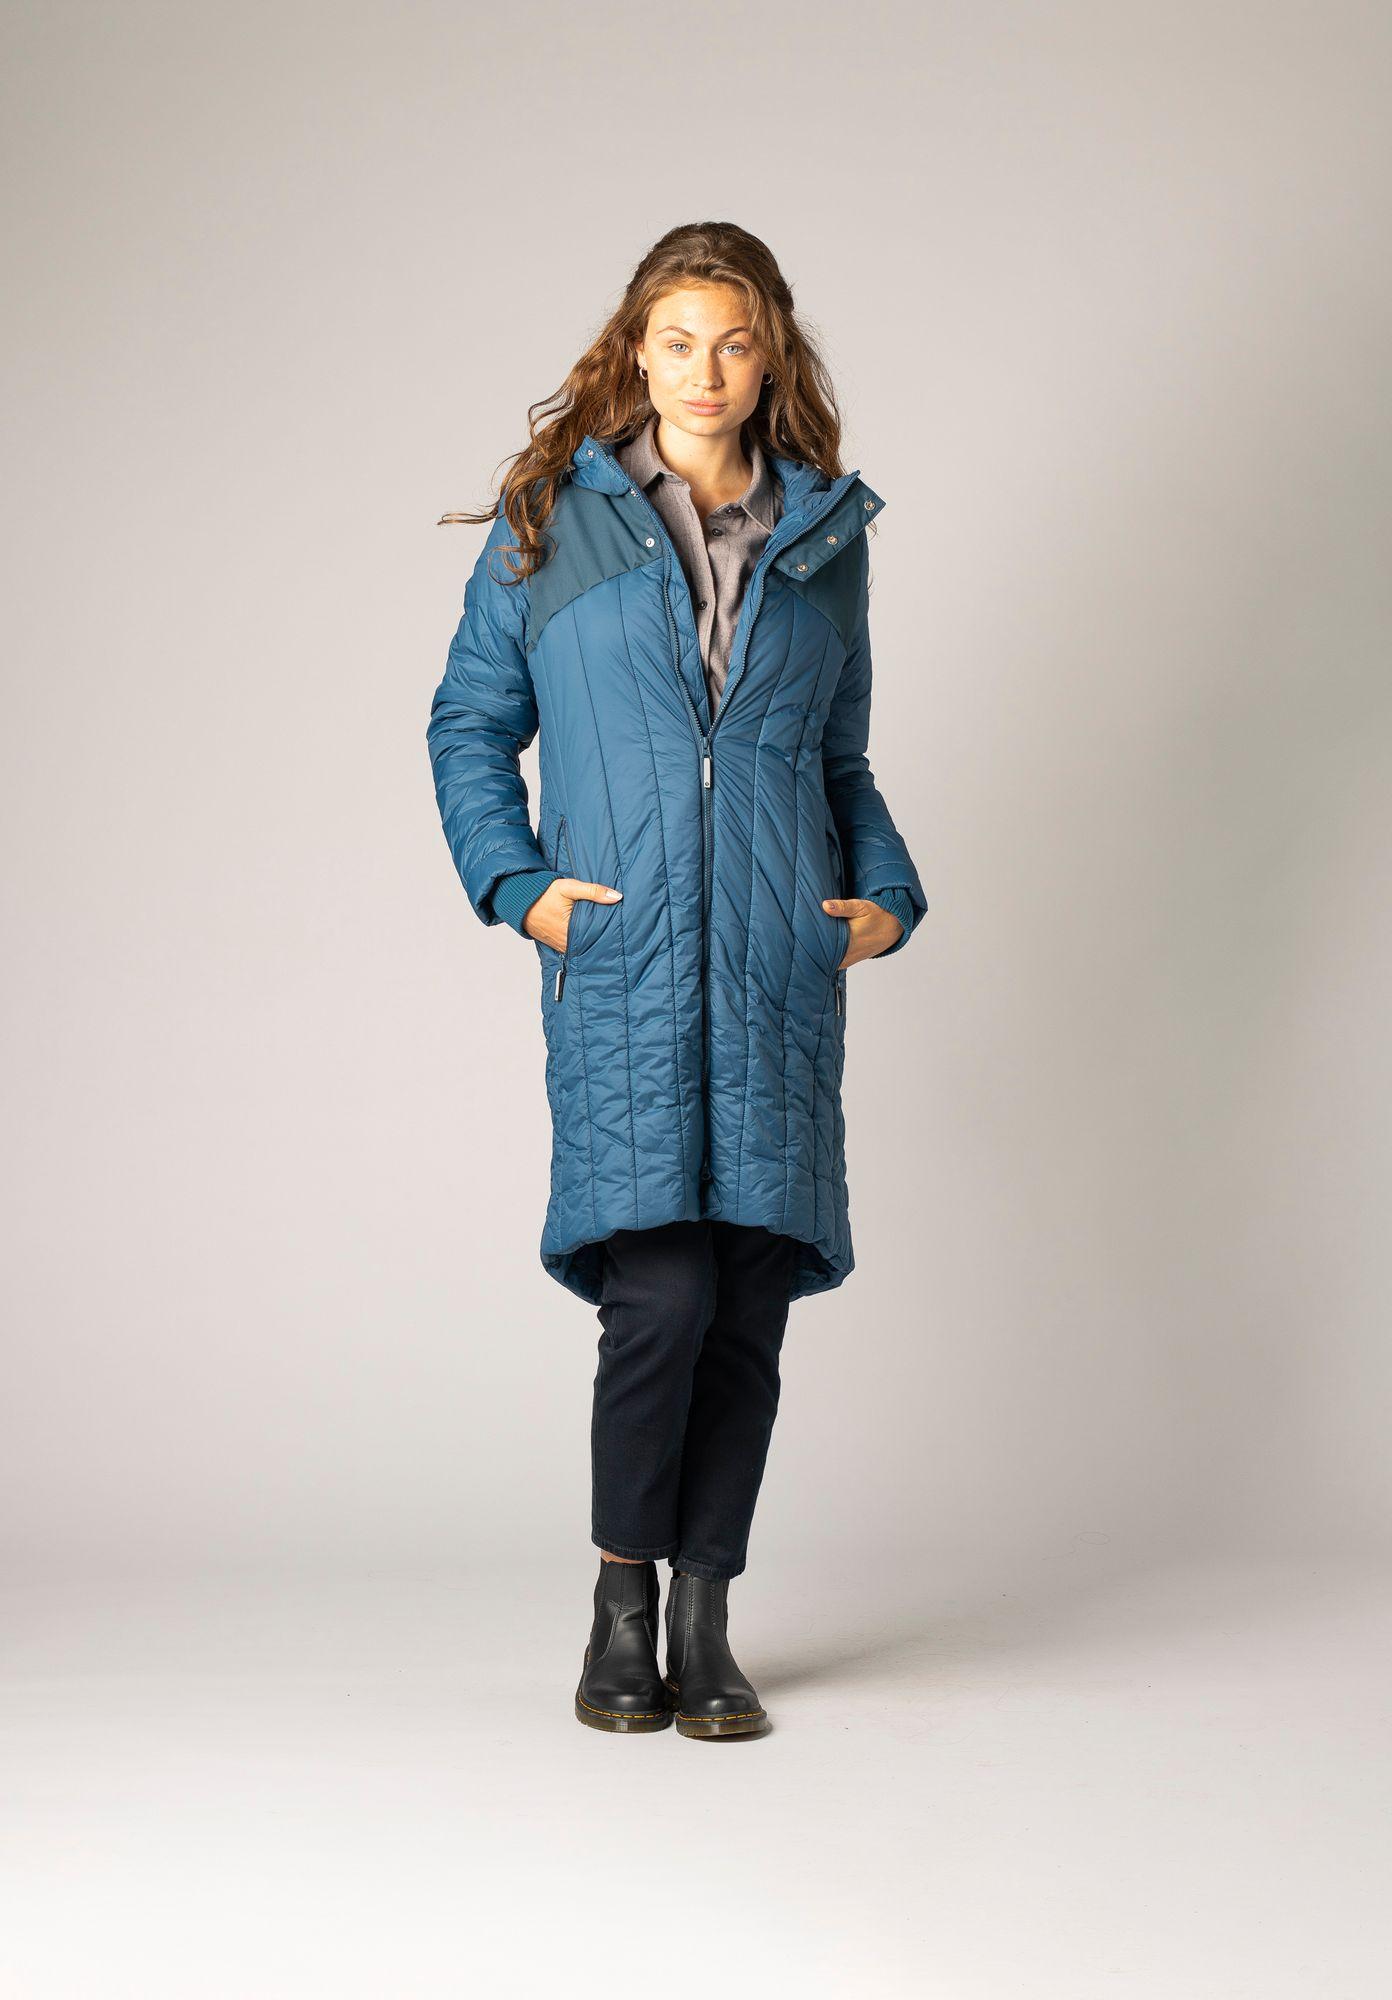 TT2003 Kapok Coat Ink Blue/Stripes